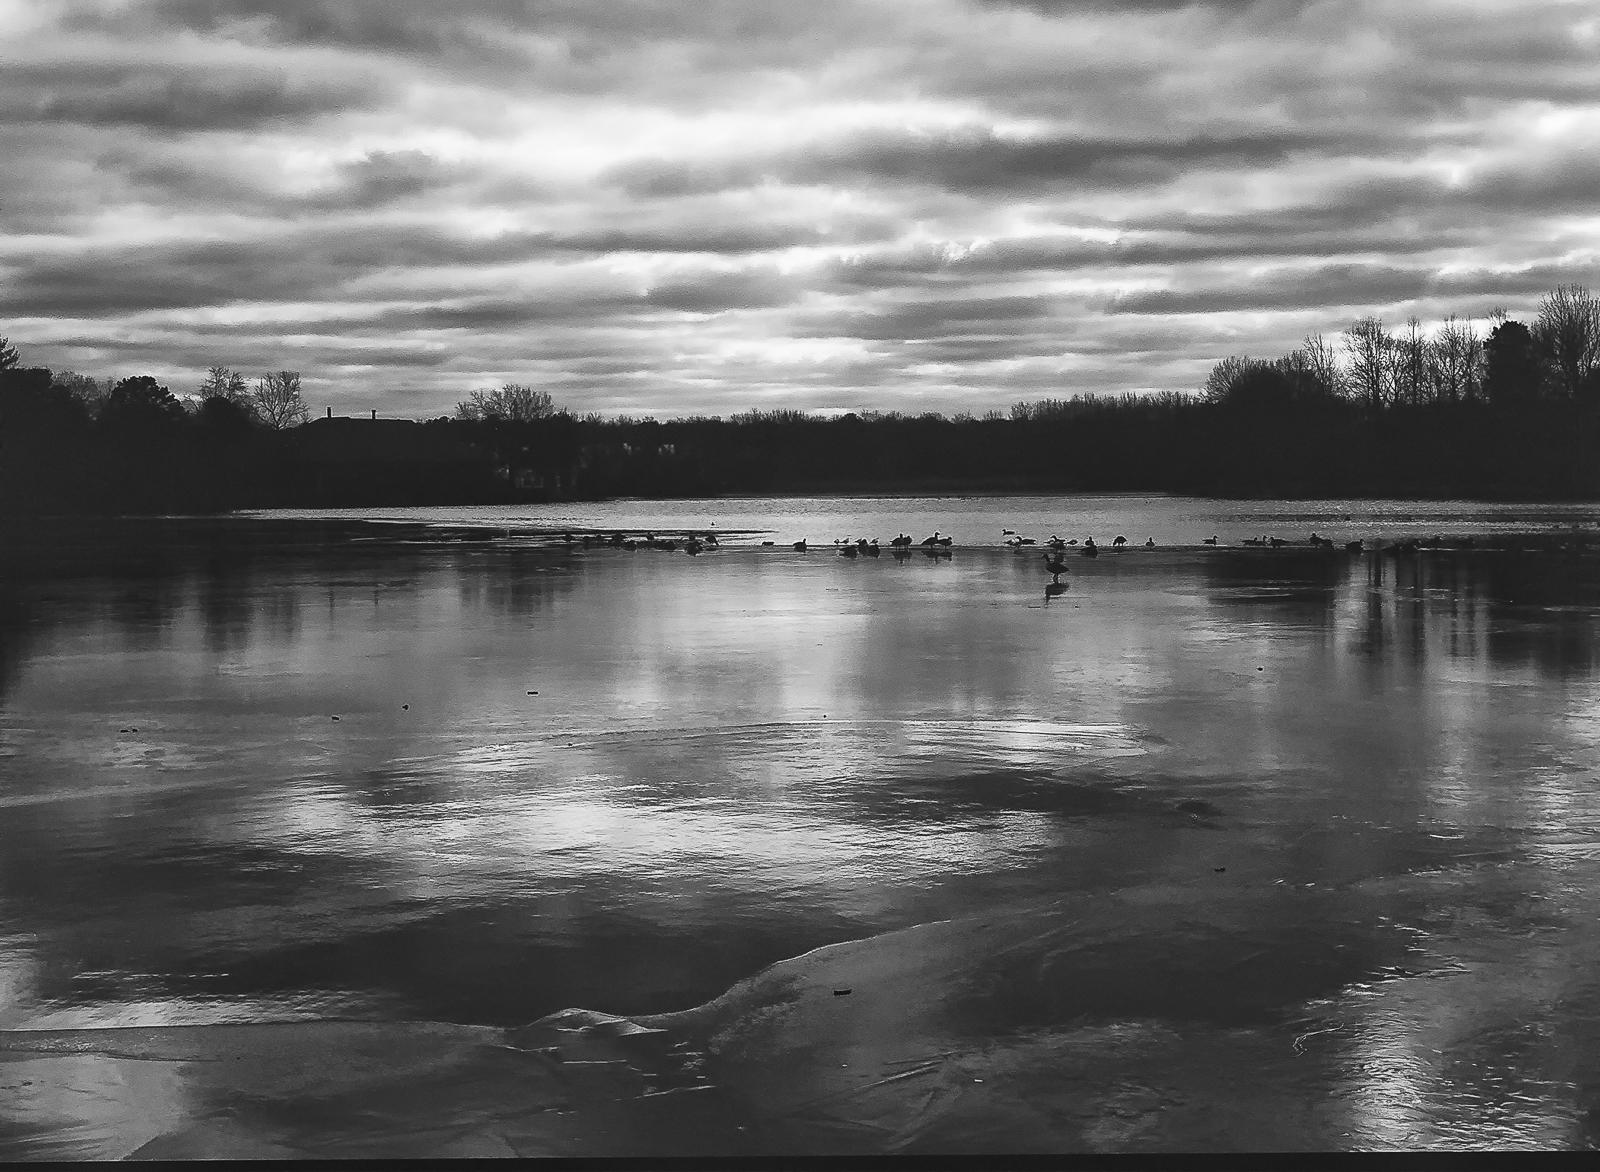 ducks-52550009